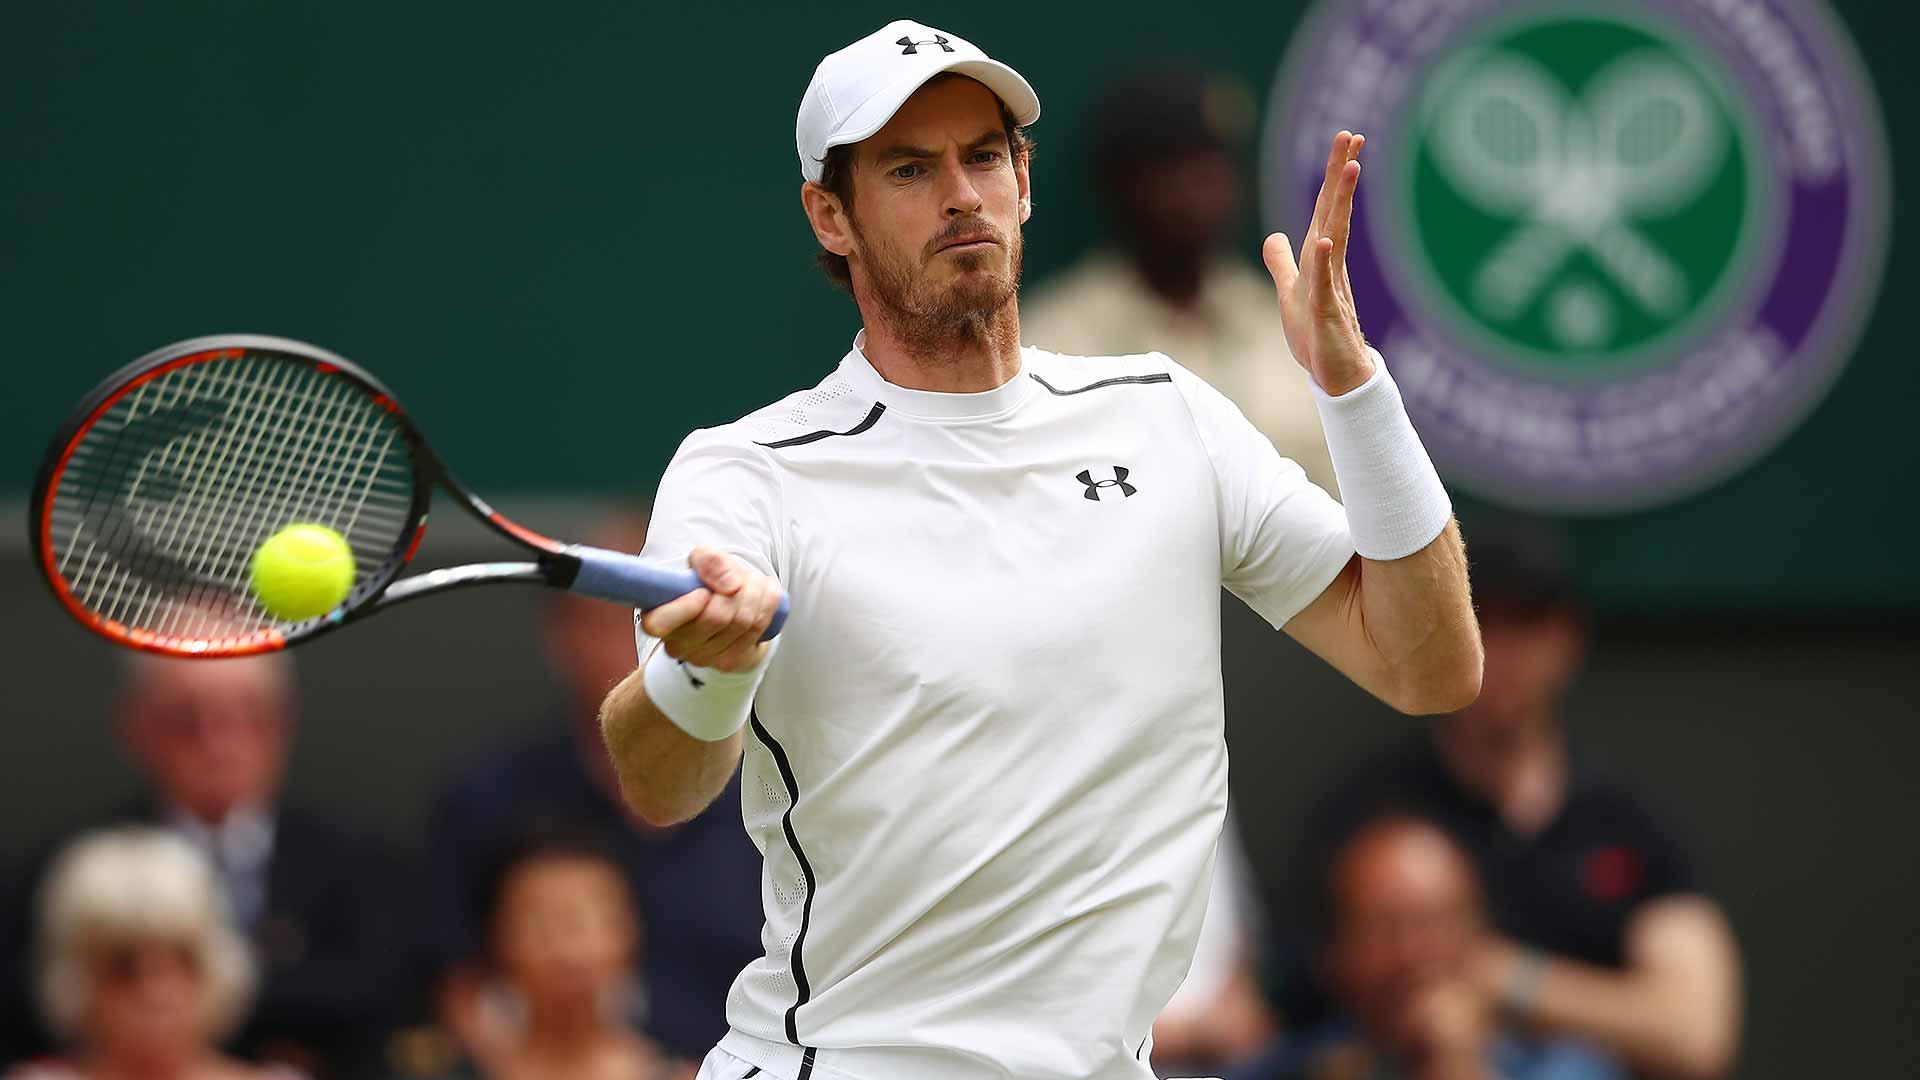 Ponturi Tenis Murray – Tsonga – Wimbledon (GBR)